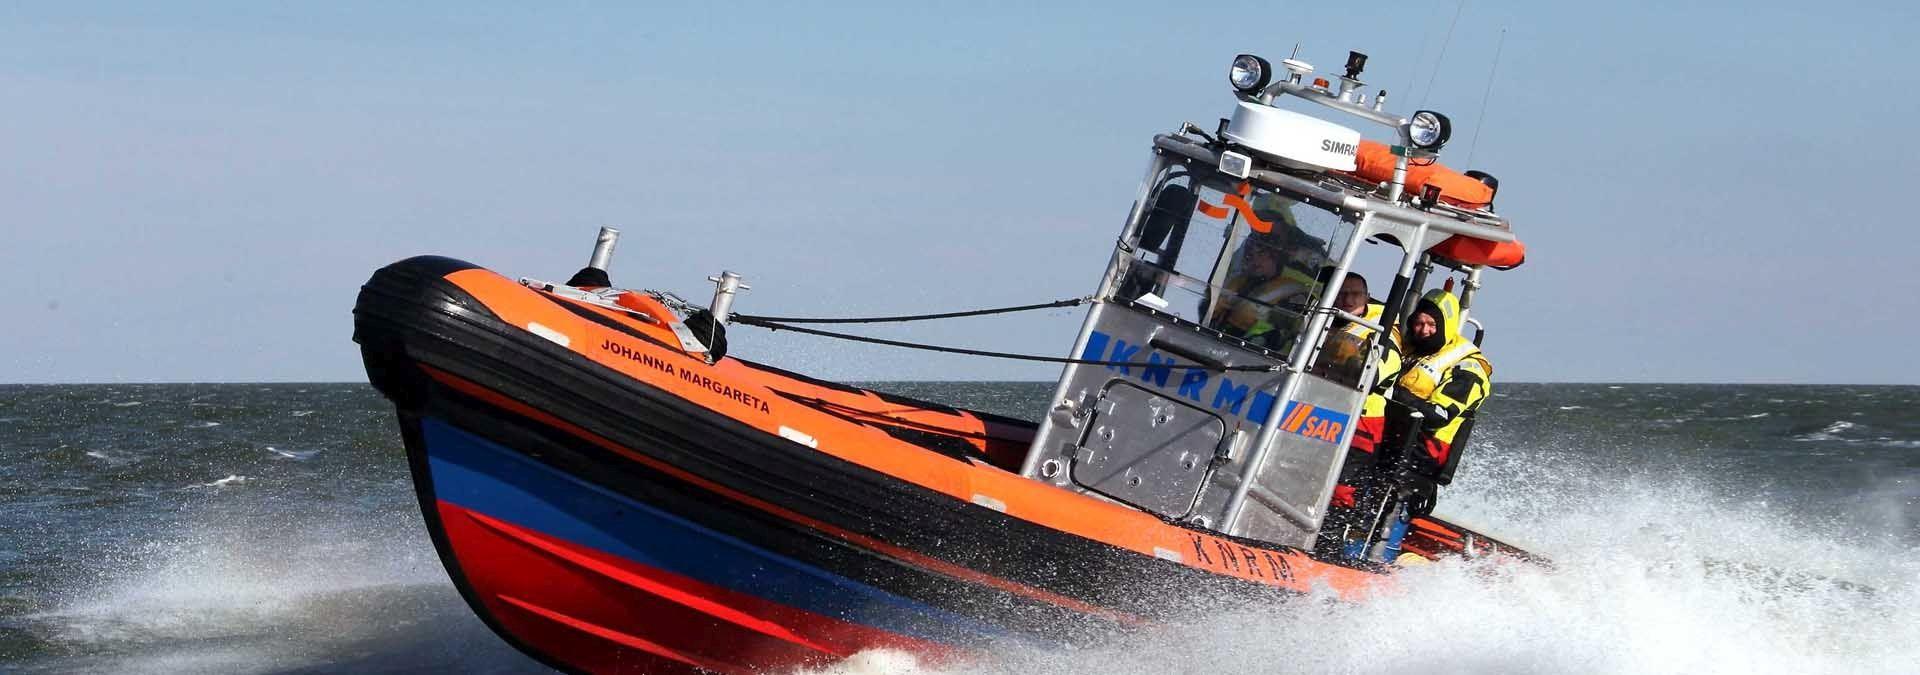 Reddingboot Johanna Margaretha